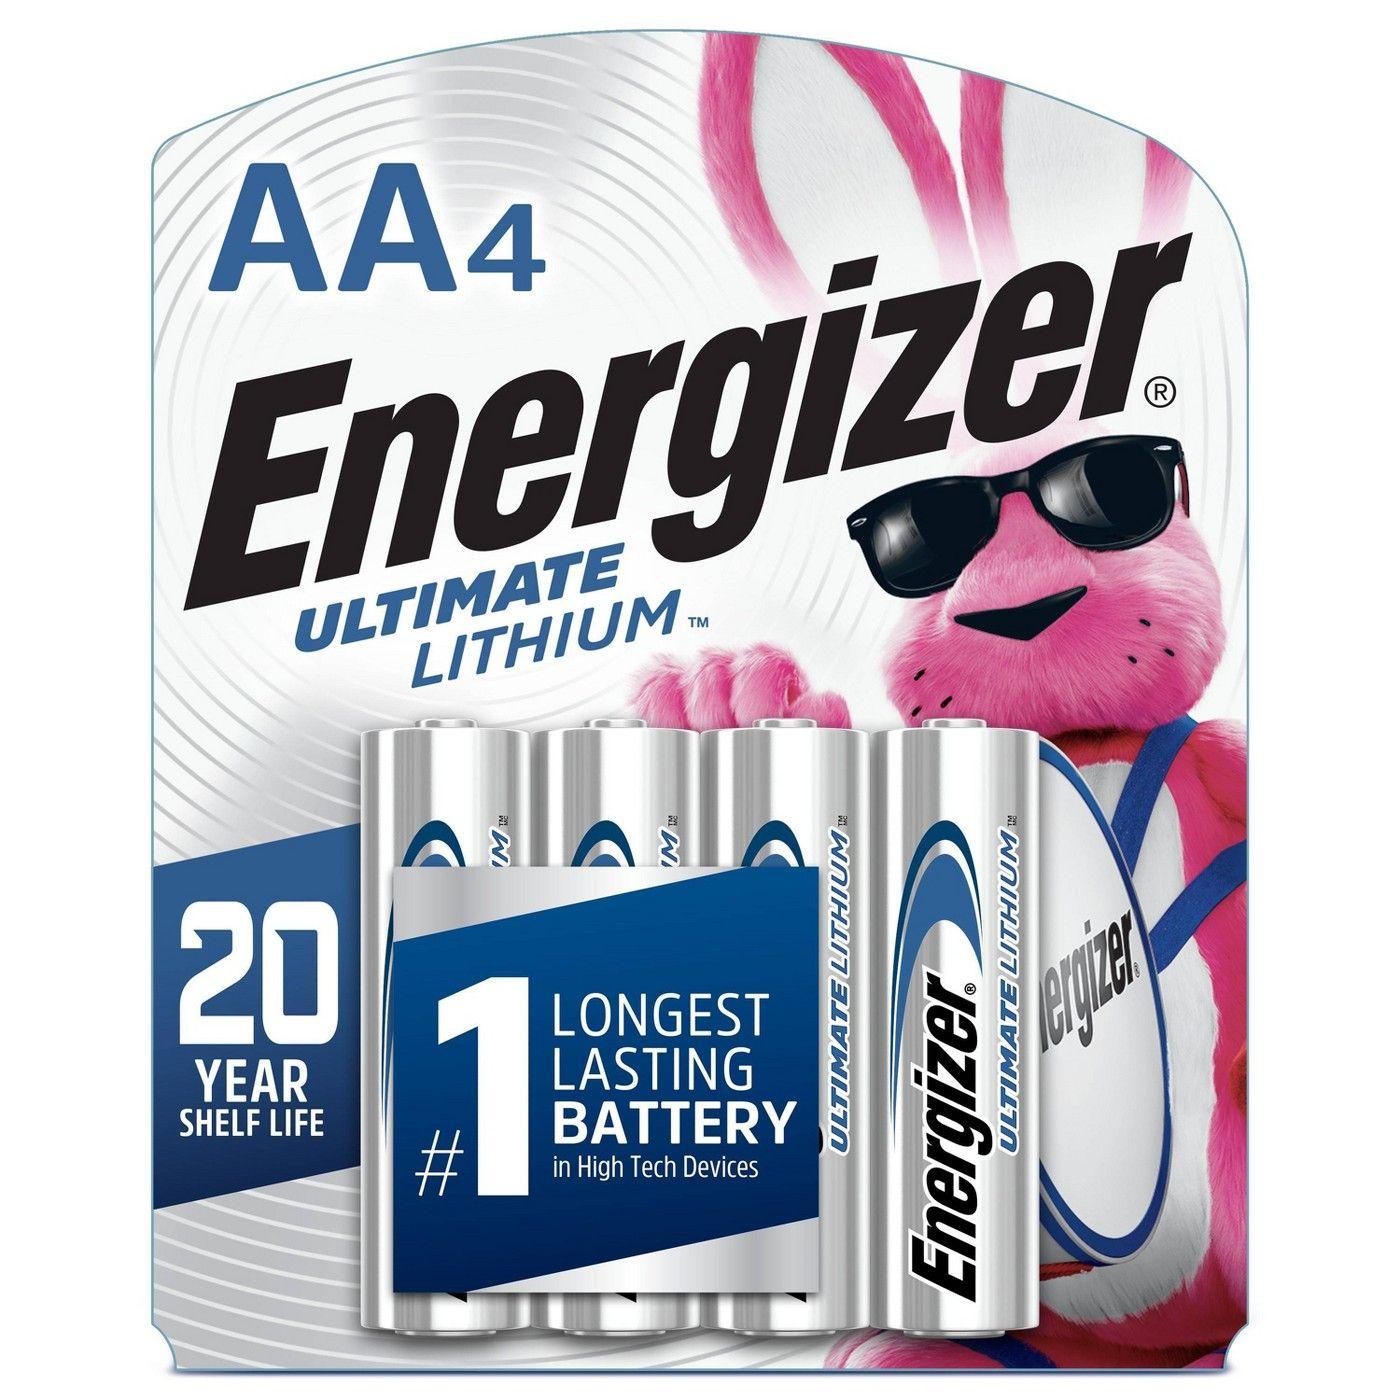 Energizer 4pk Ultimate Lithium Aa Batteries